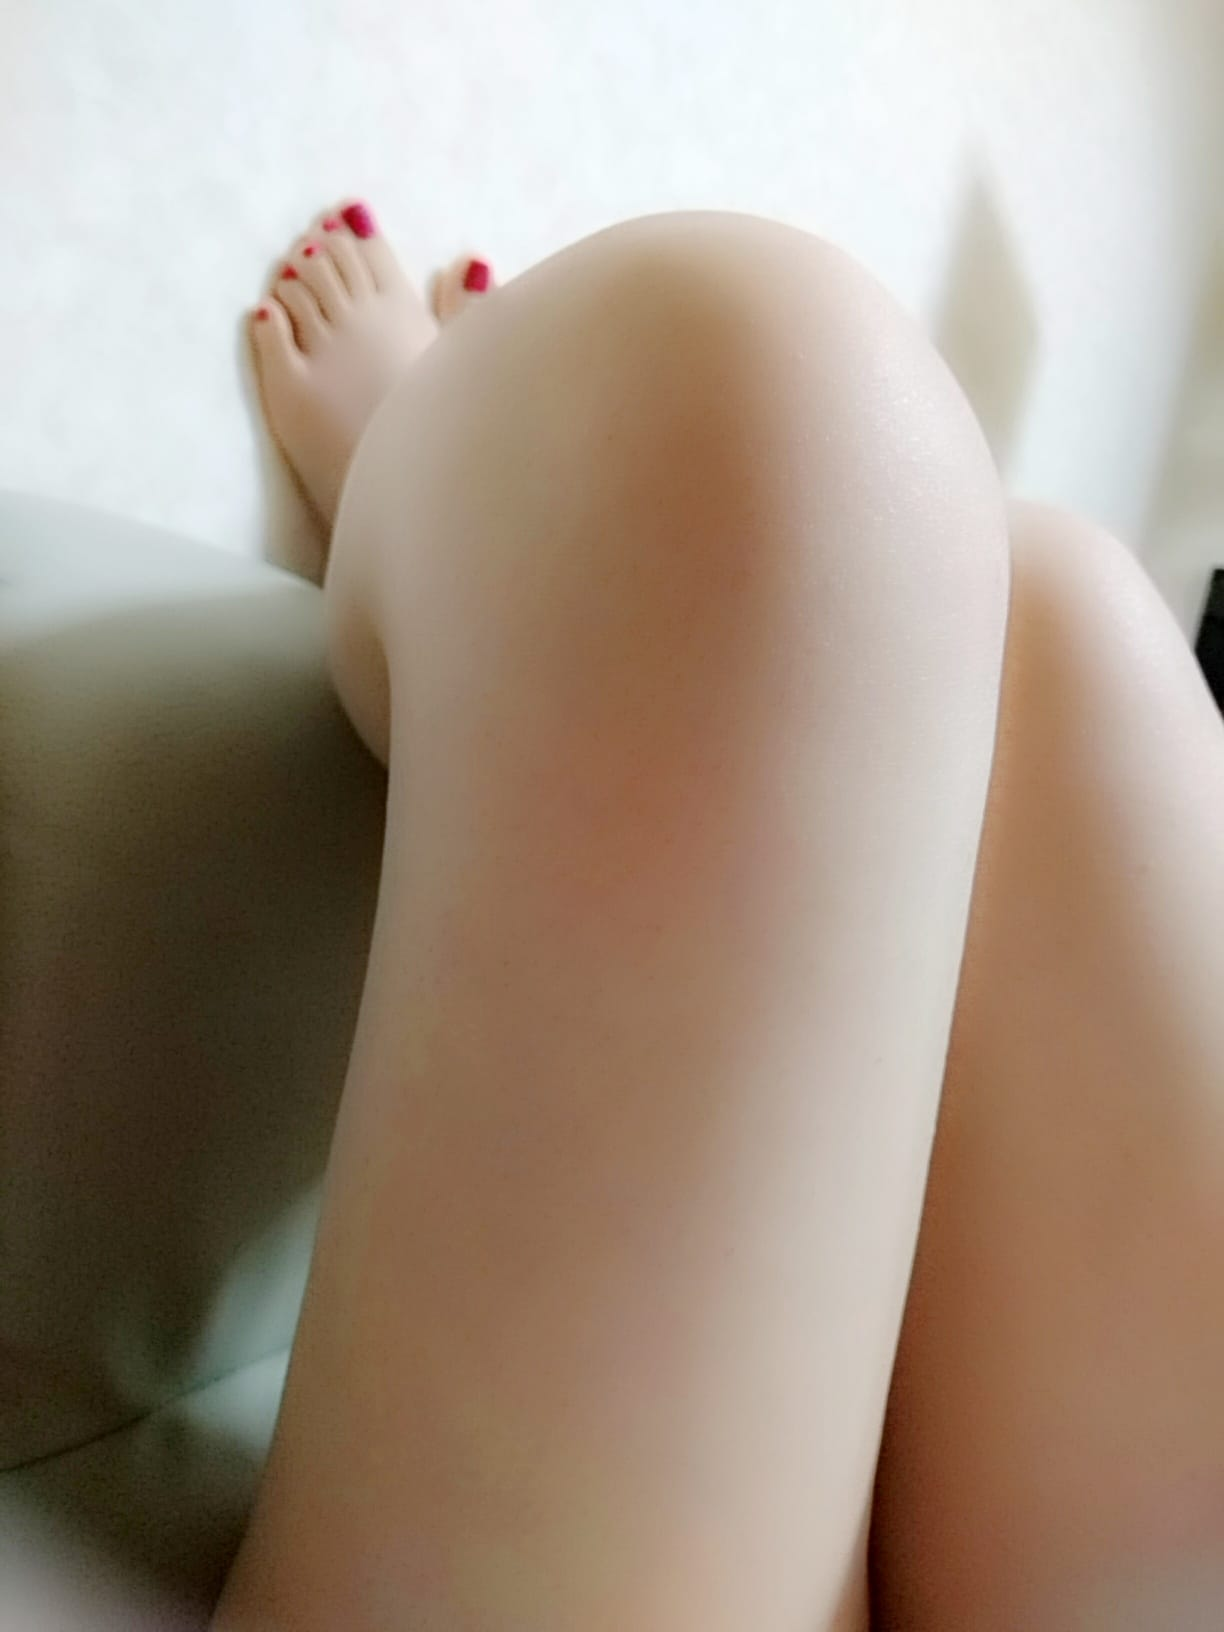 「zzz」05/28(05/28) 23:00 | 【体験】れなの写メ・風俗動画